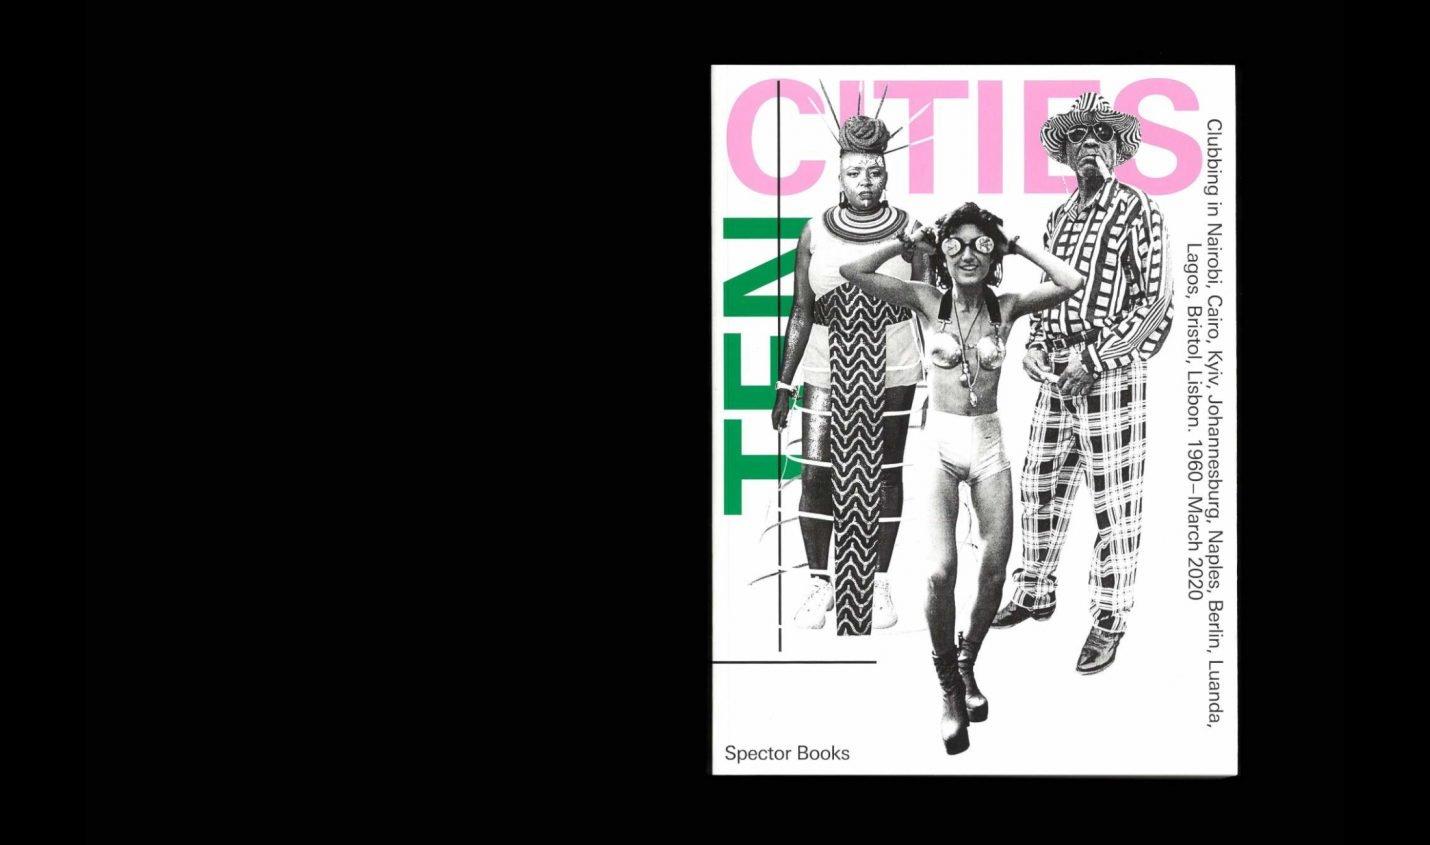 Ten Cities: Buch über Clubgeschichte in Afrika & Europa